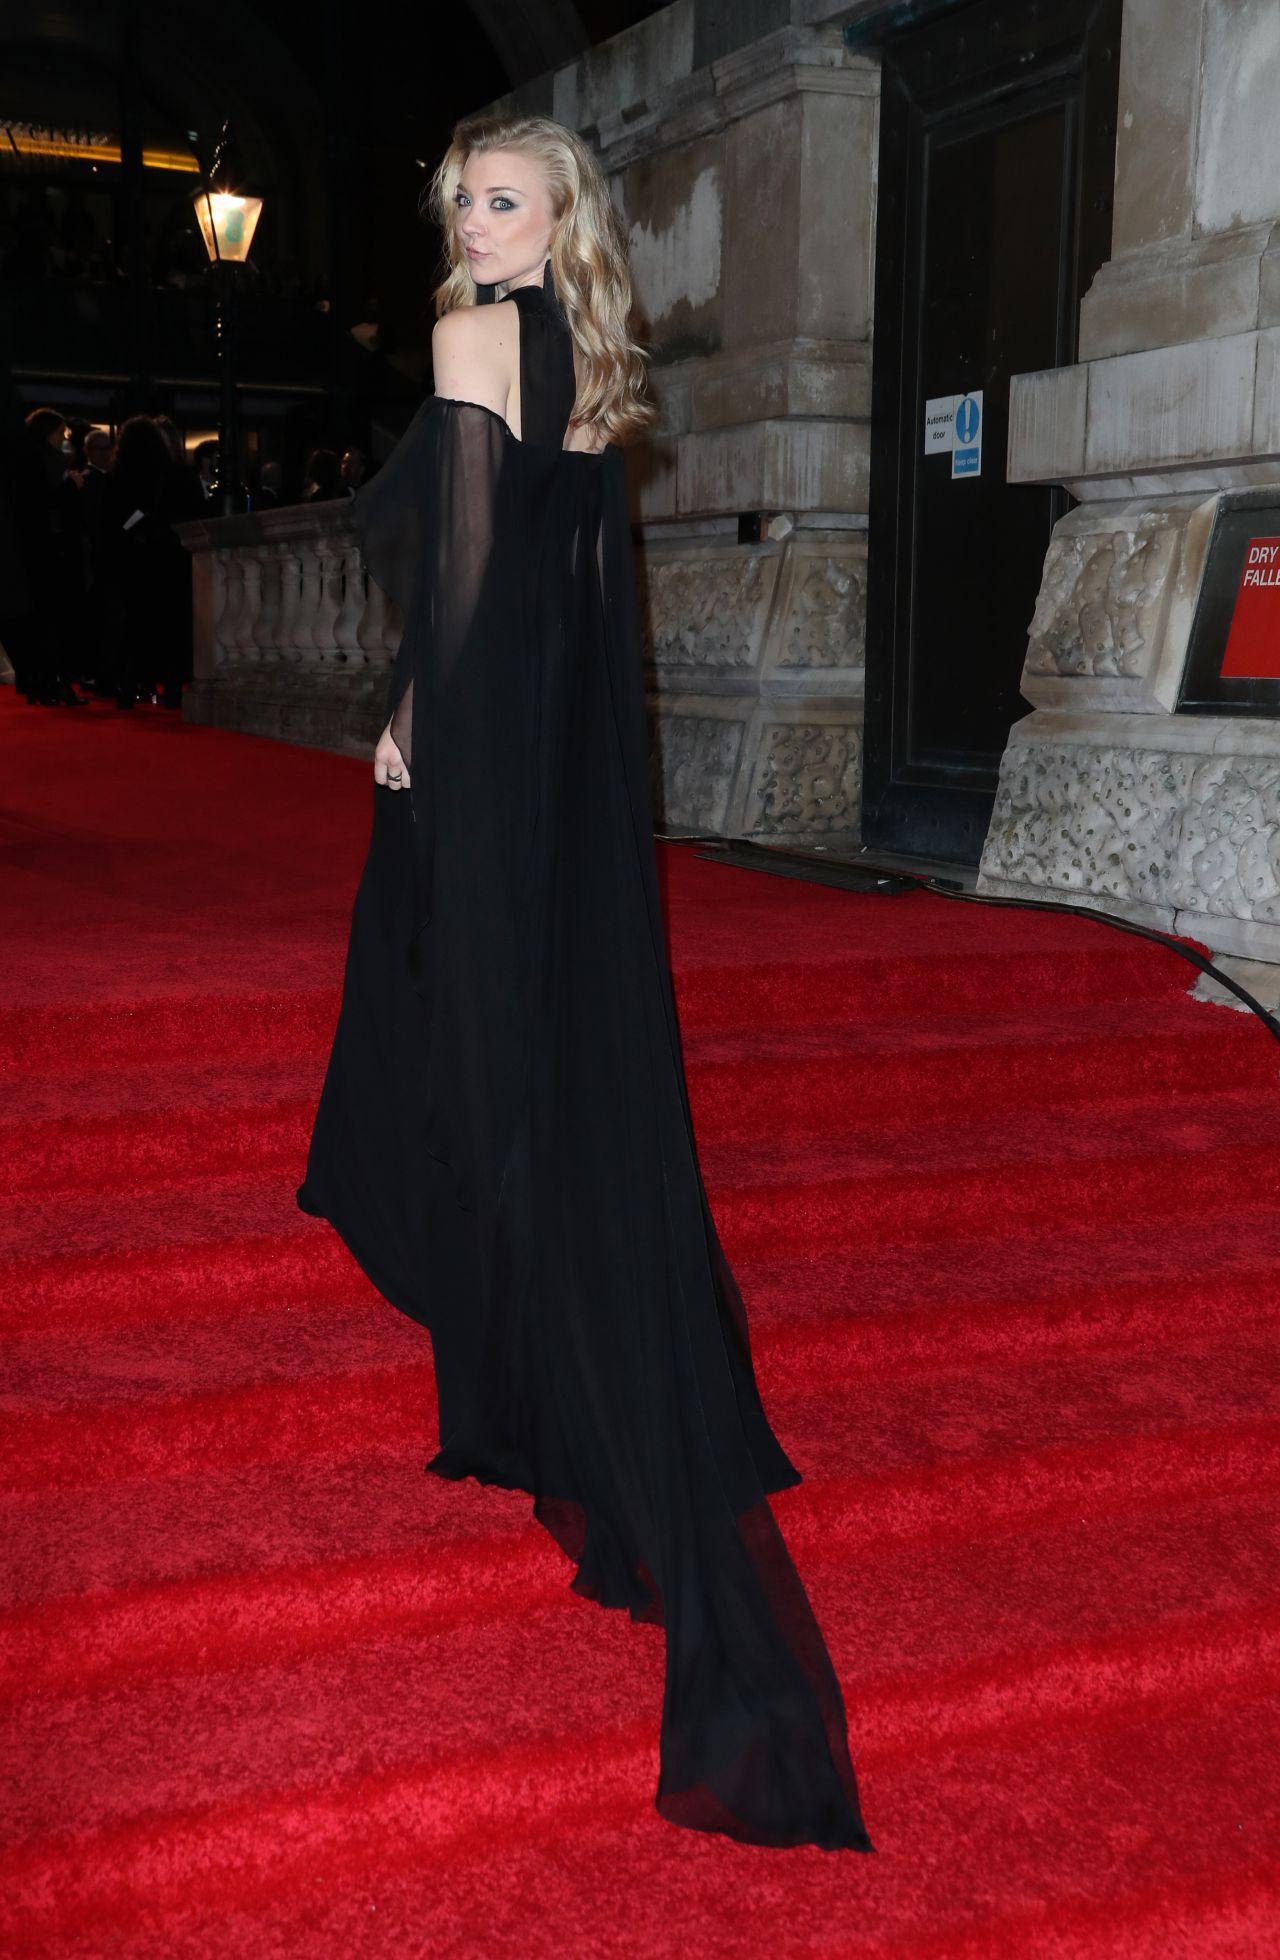 Natalie Dormer 2018 British Academy Film Awards